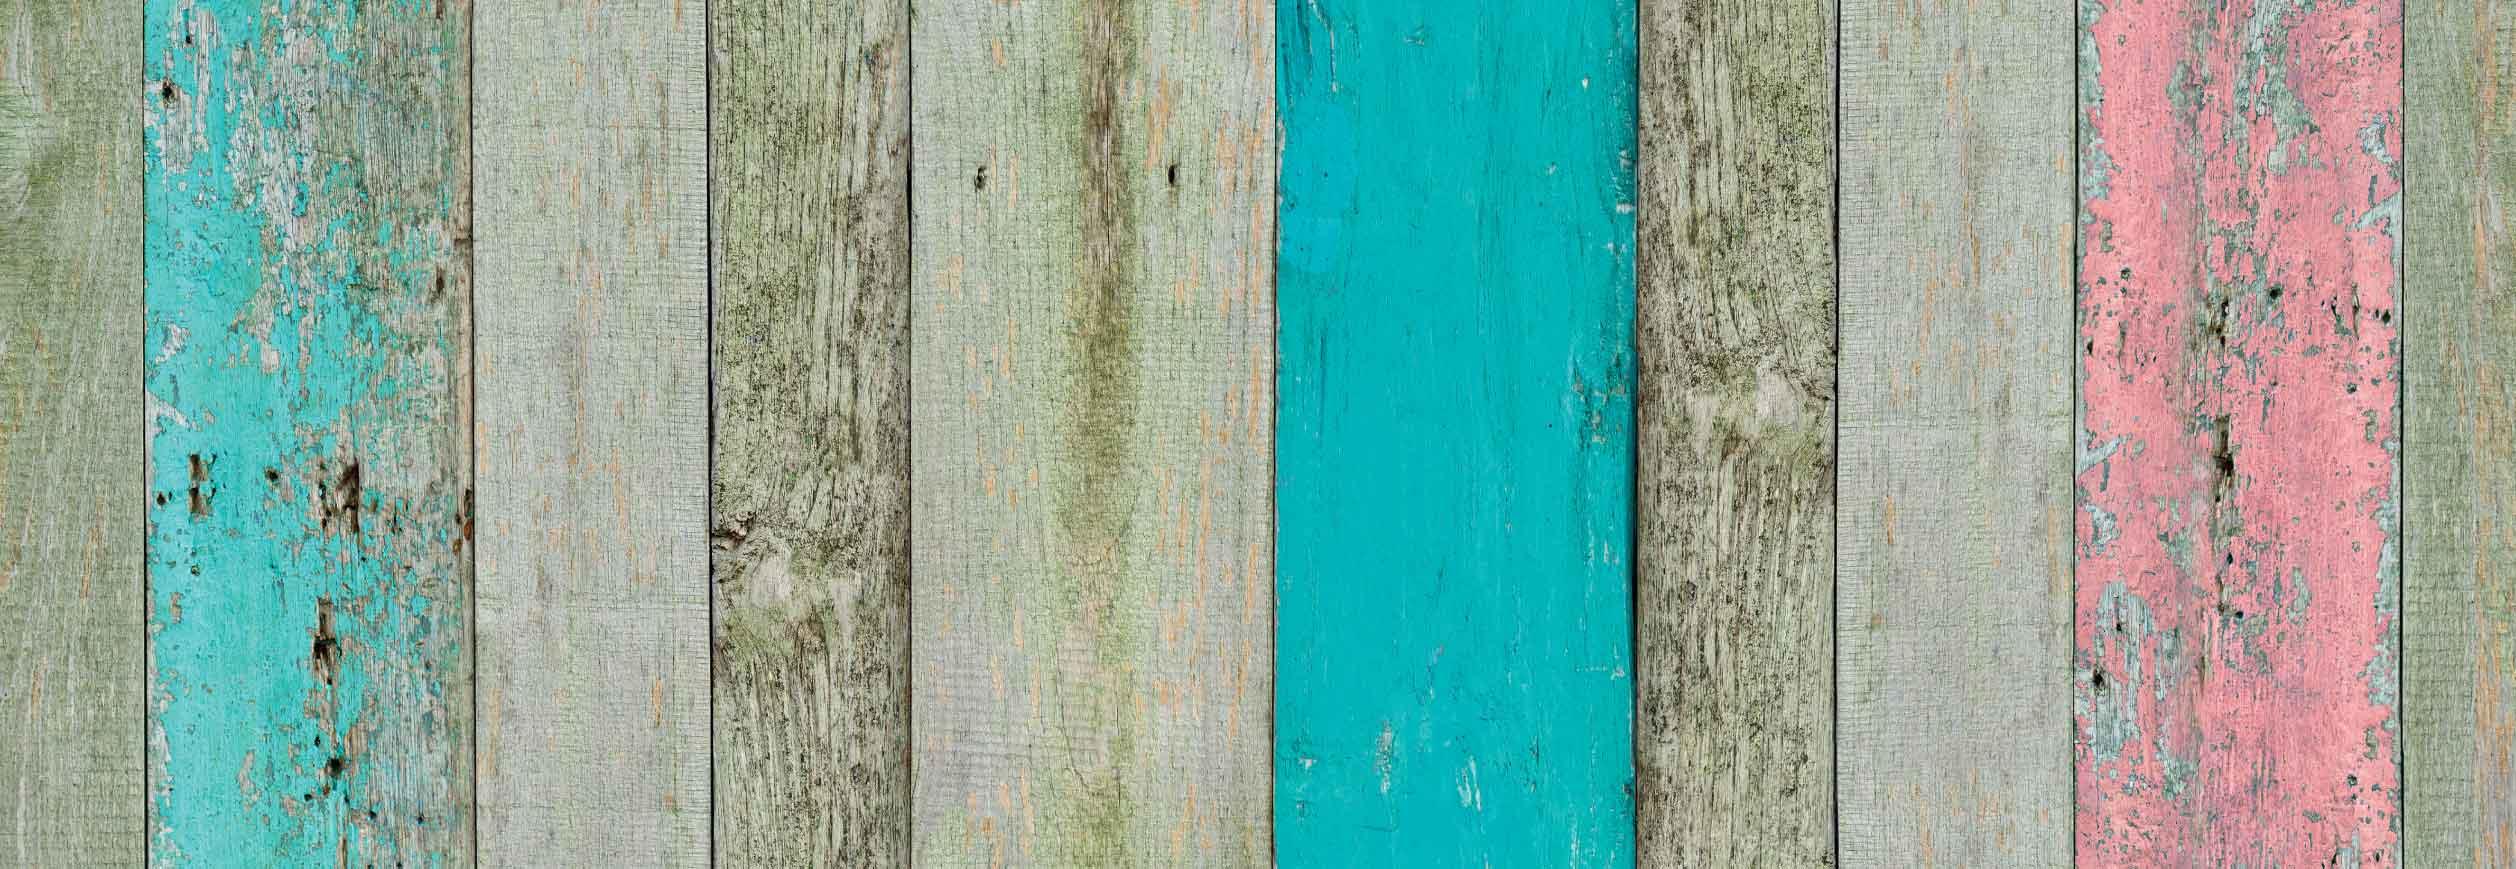 Plakfolie Grenen Sloophout 3410 - 45cm x 2m